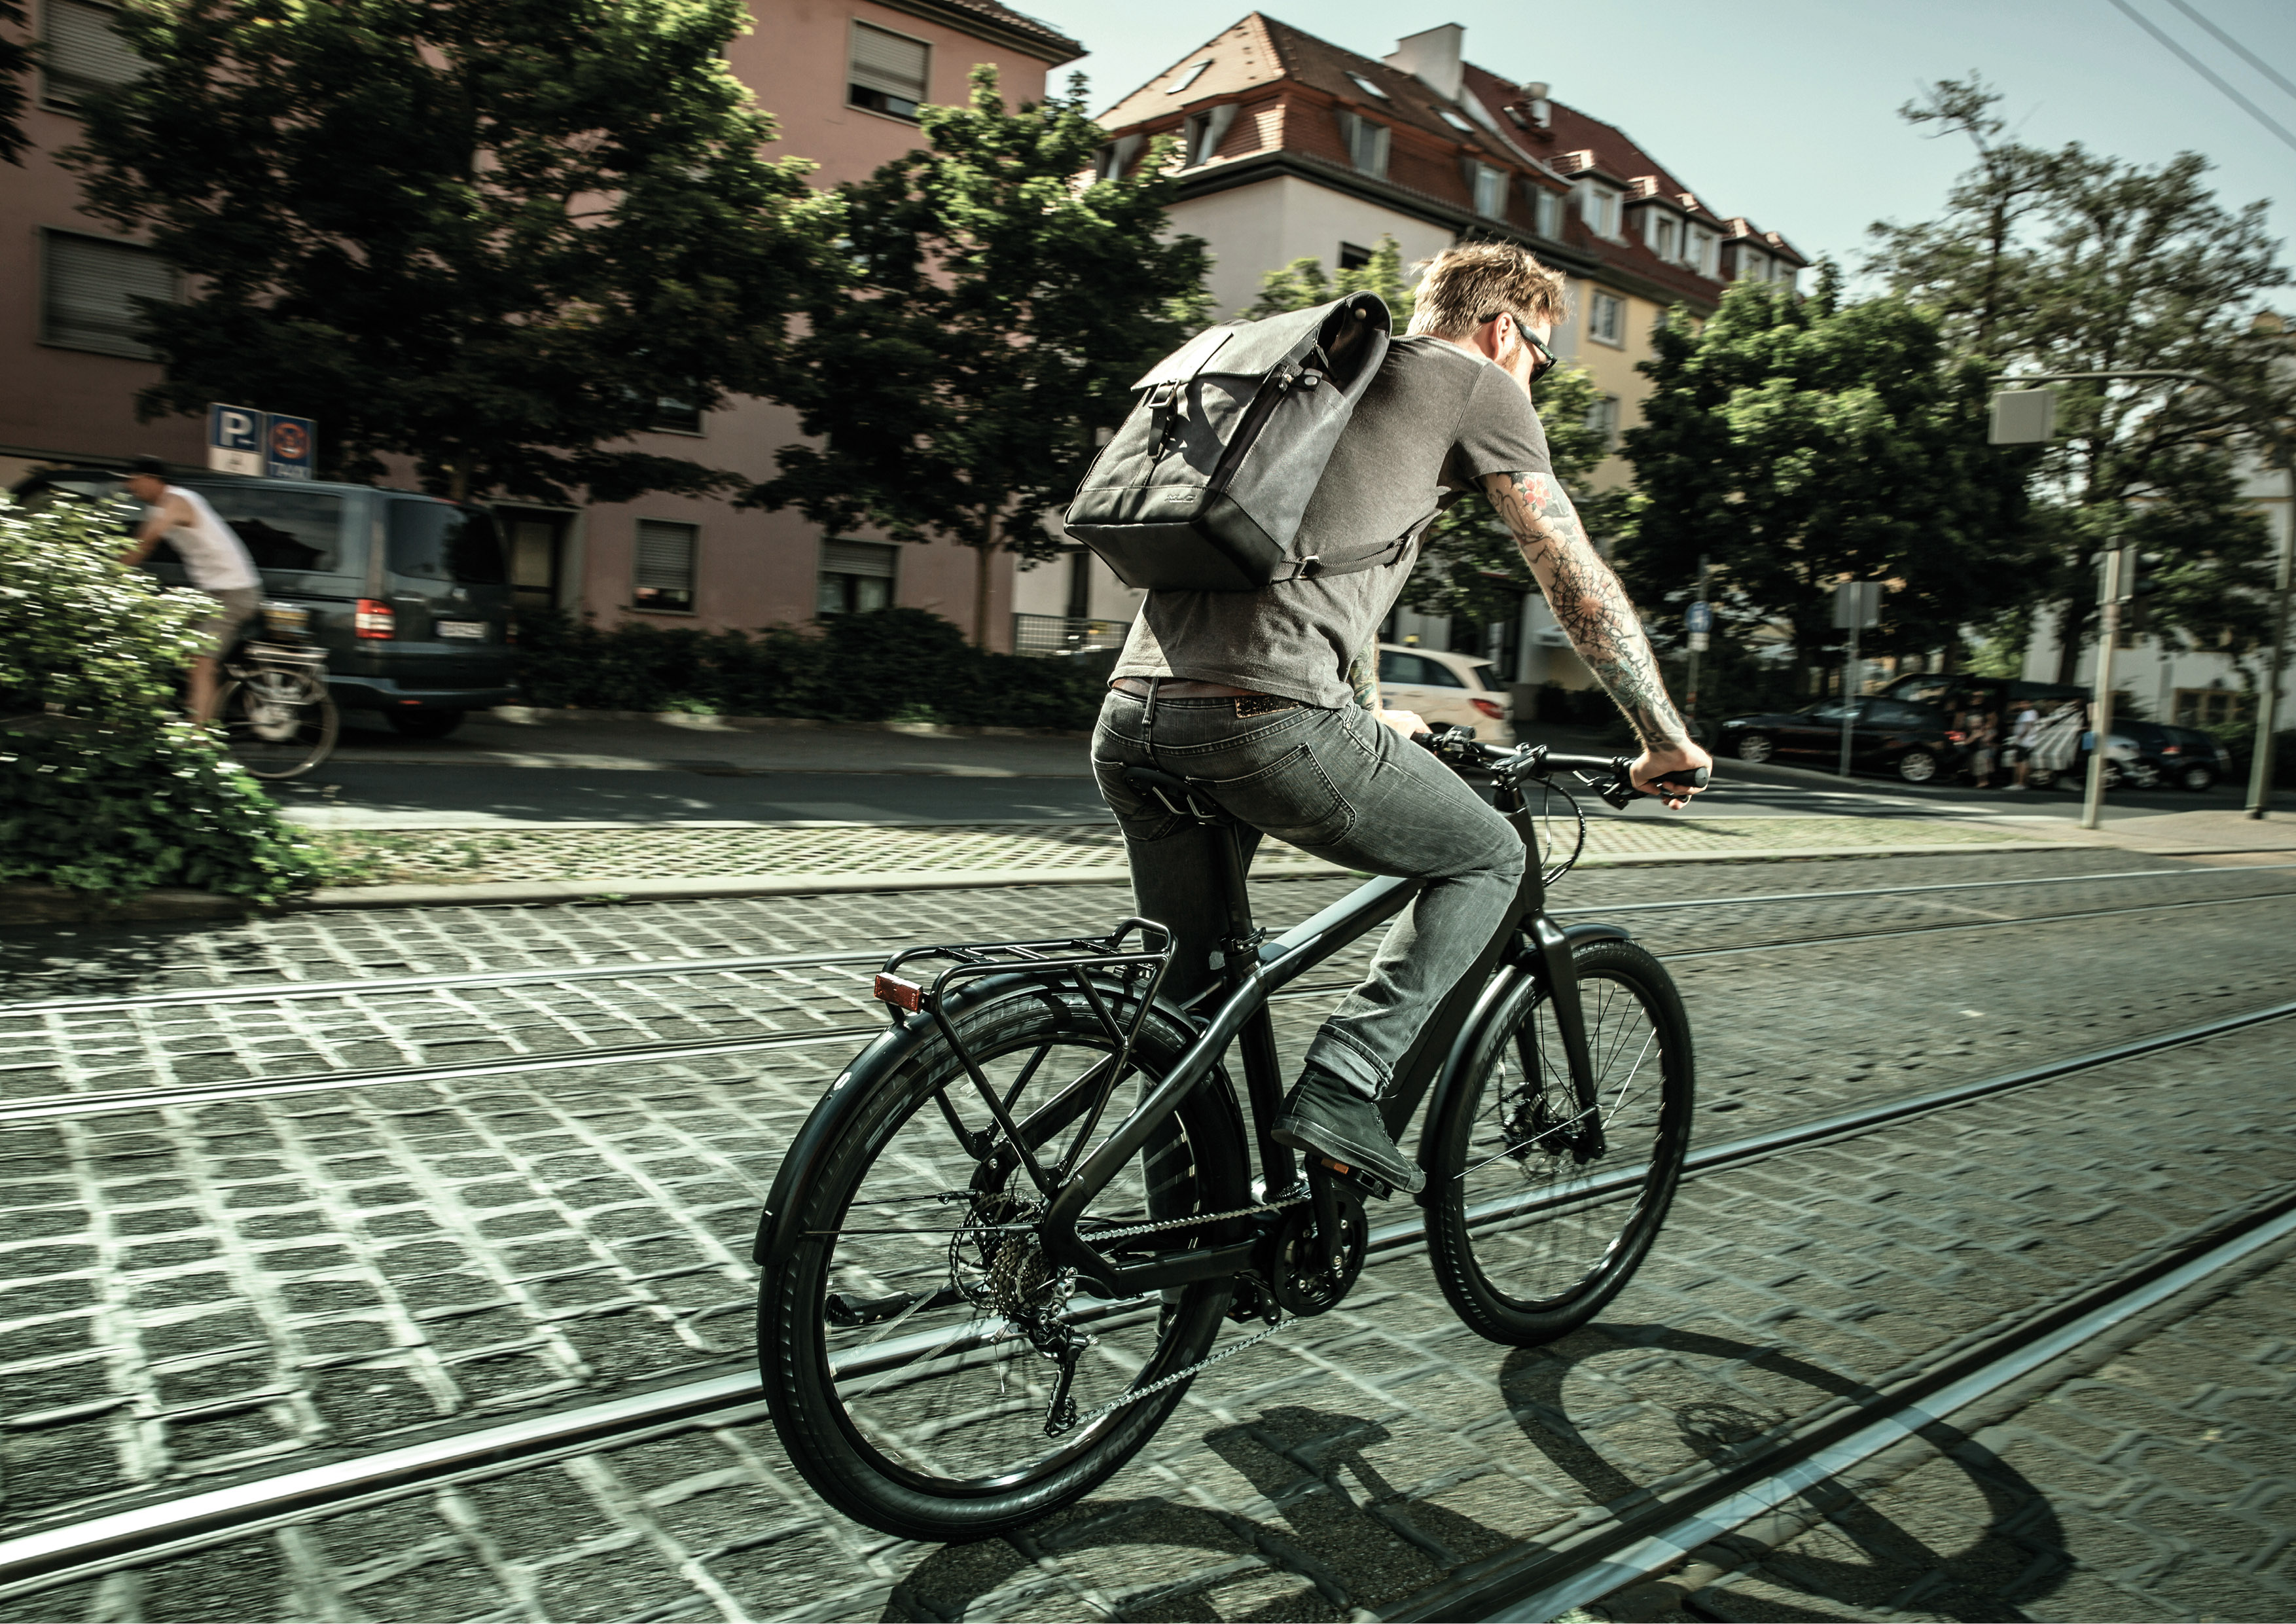 Droht E-Bike-Versicherungspflicht durch EU?